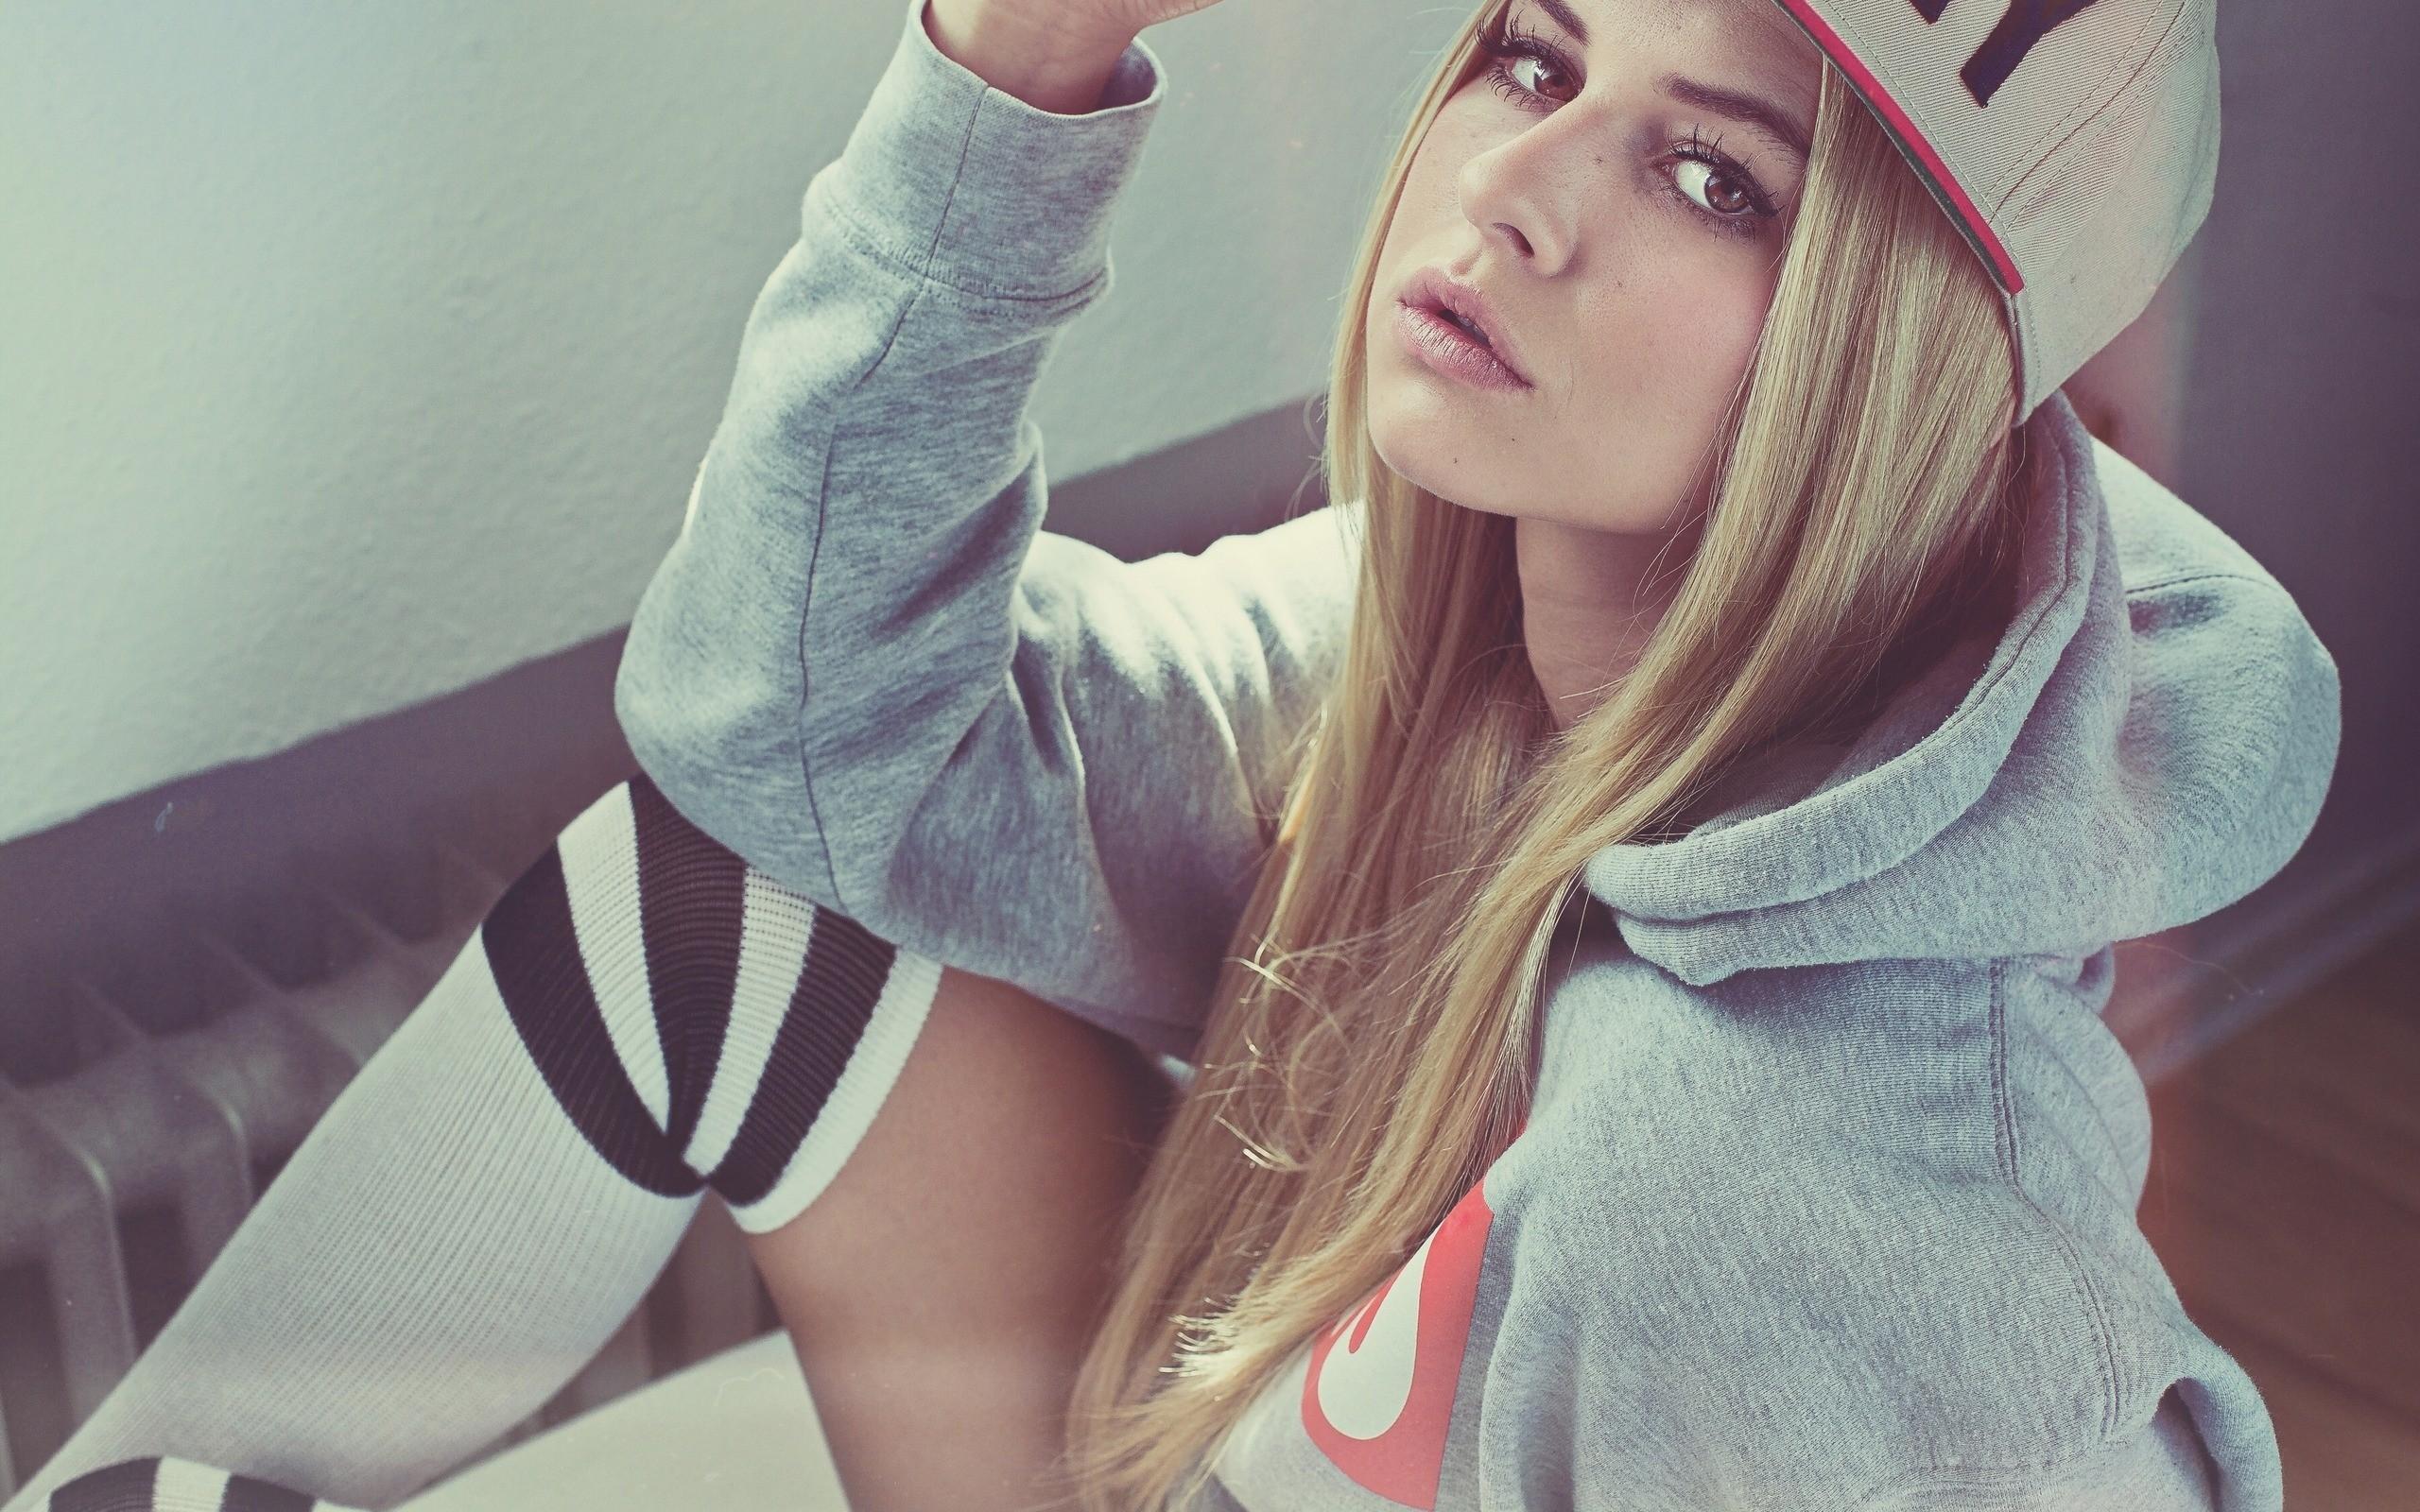 Красивые девушки на аву вконтакте картинки